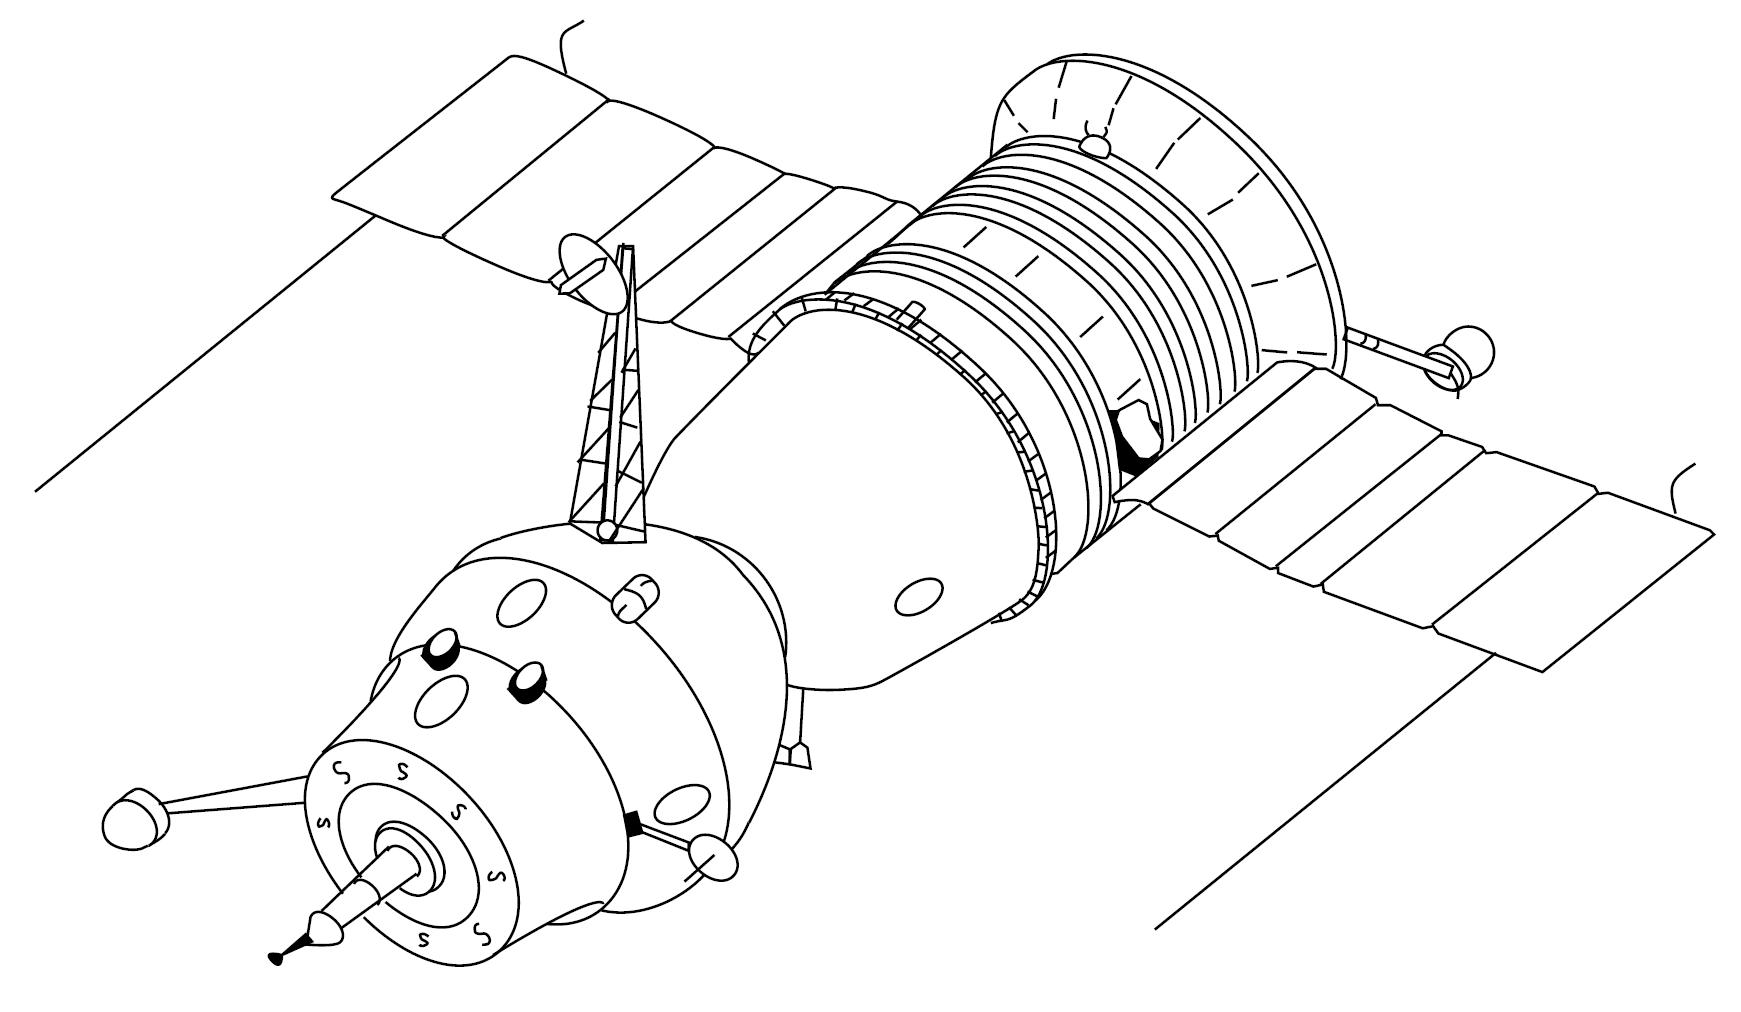 Soyuz_7K-OK(A)_drawing.png